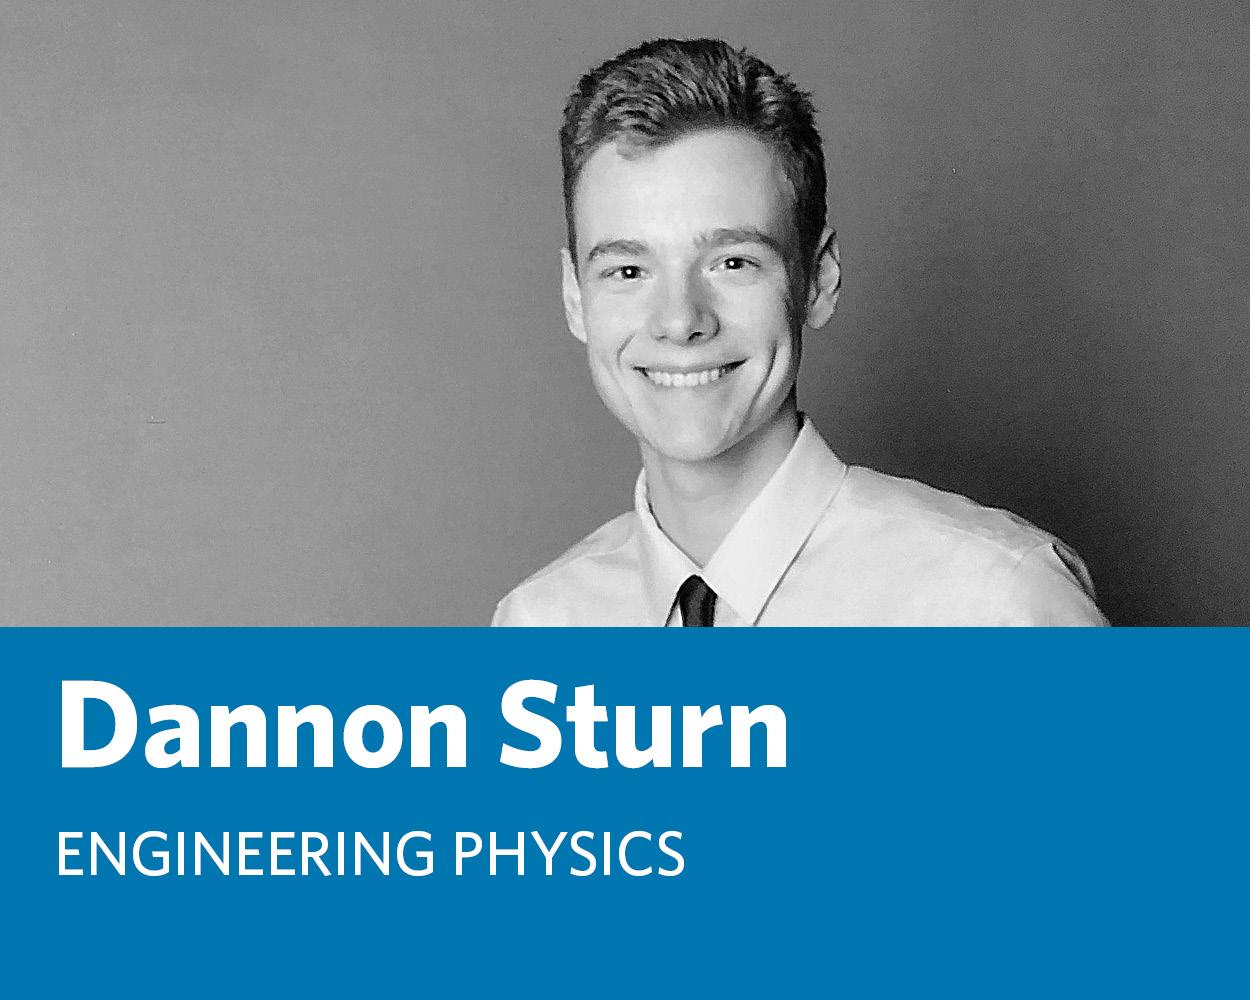 Dannon Sturn: Engineering Physics